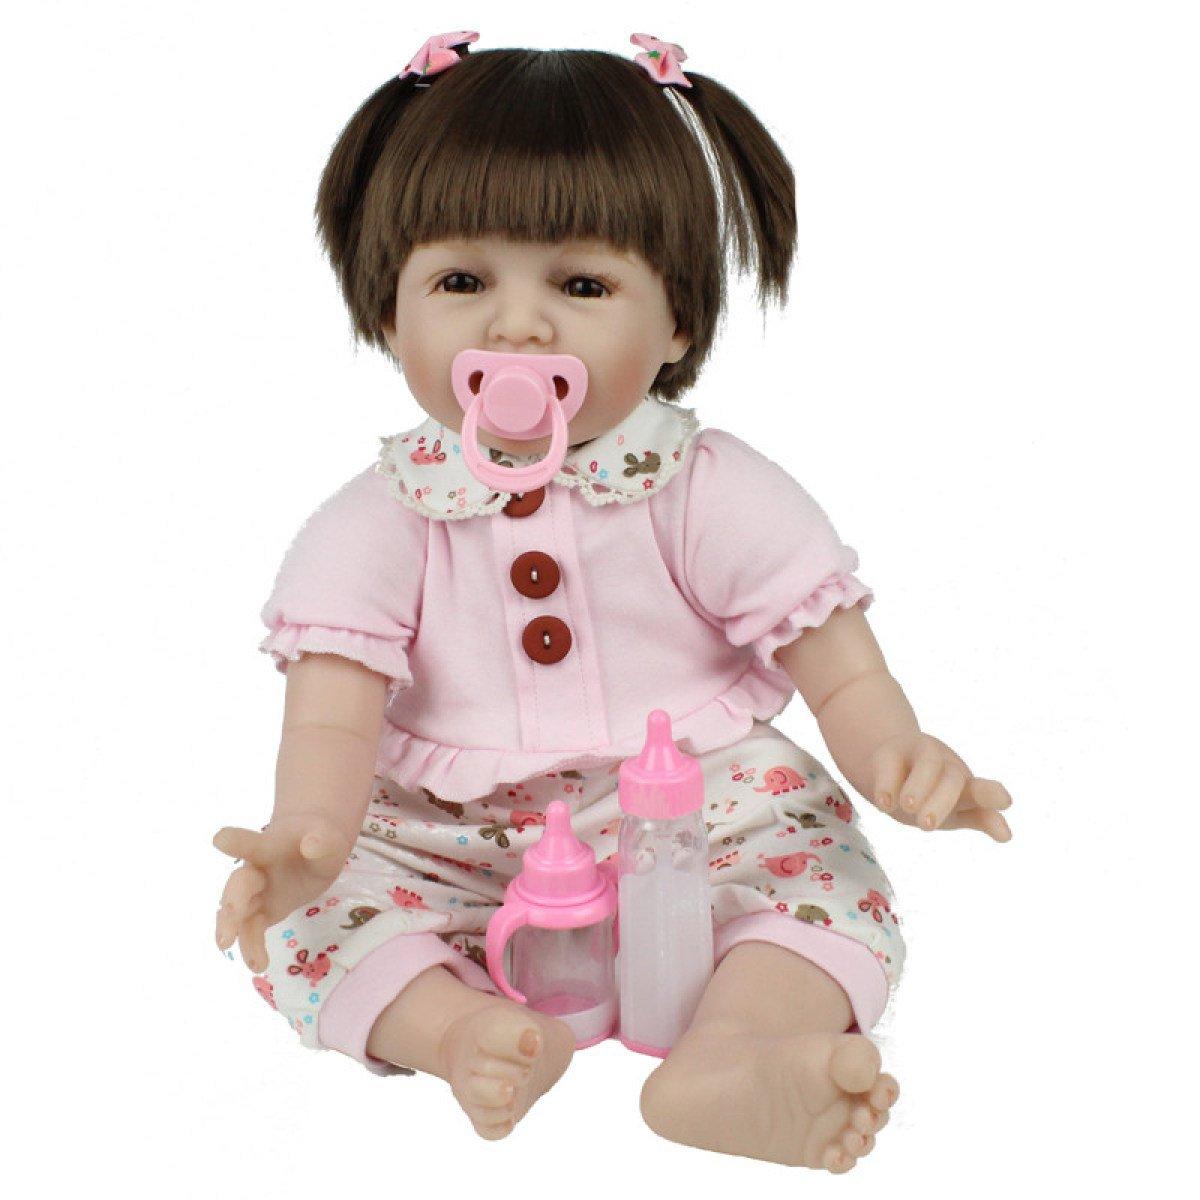 YihangフルSiliconeビニールRebornベビー人形RealisticガールBabies人形22インチ55 cm Lifelikeプリンセスキッズ用おもちゃ子供誕生日ギフト初期学習写真撮影プロップ   B07BPNGQ6R